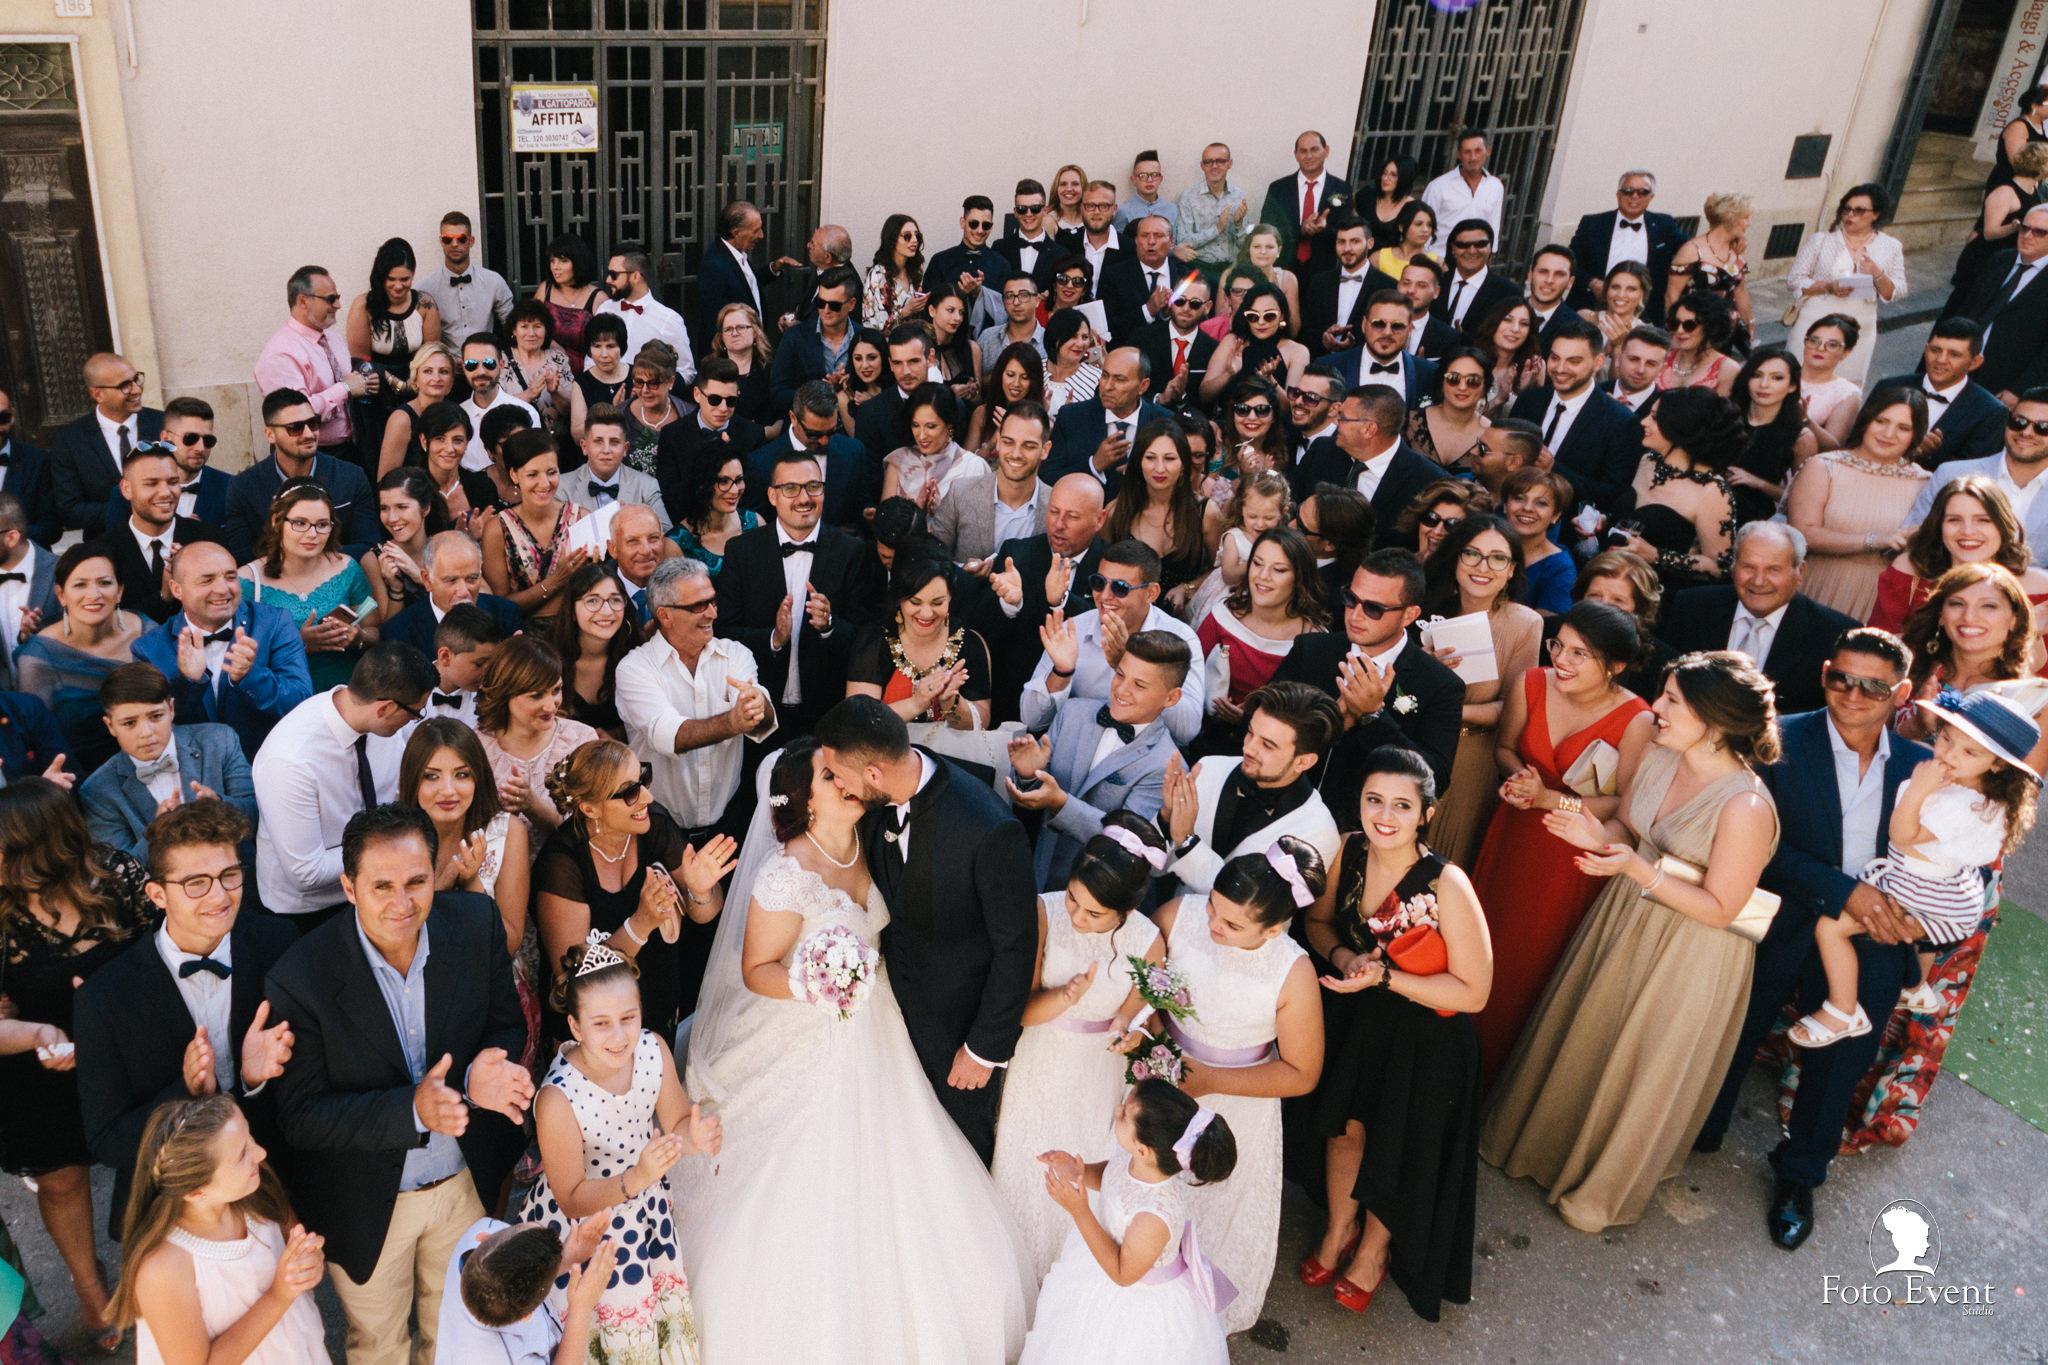 2018-06-29 Matrimonio Angelica e Angelo Bracco Fisheye 103